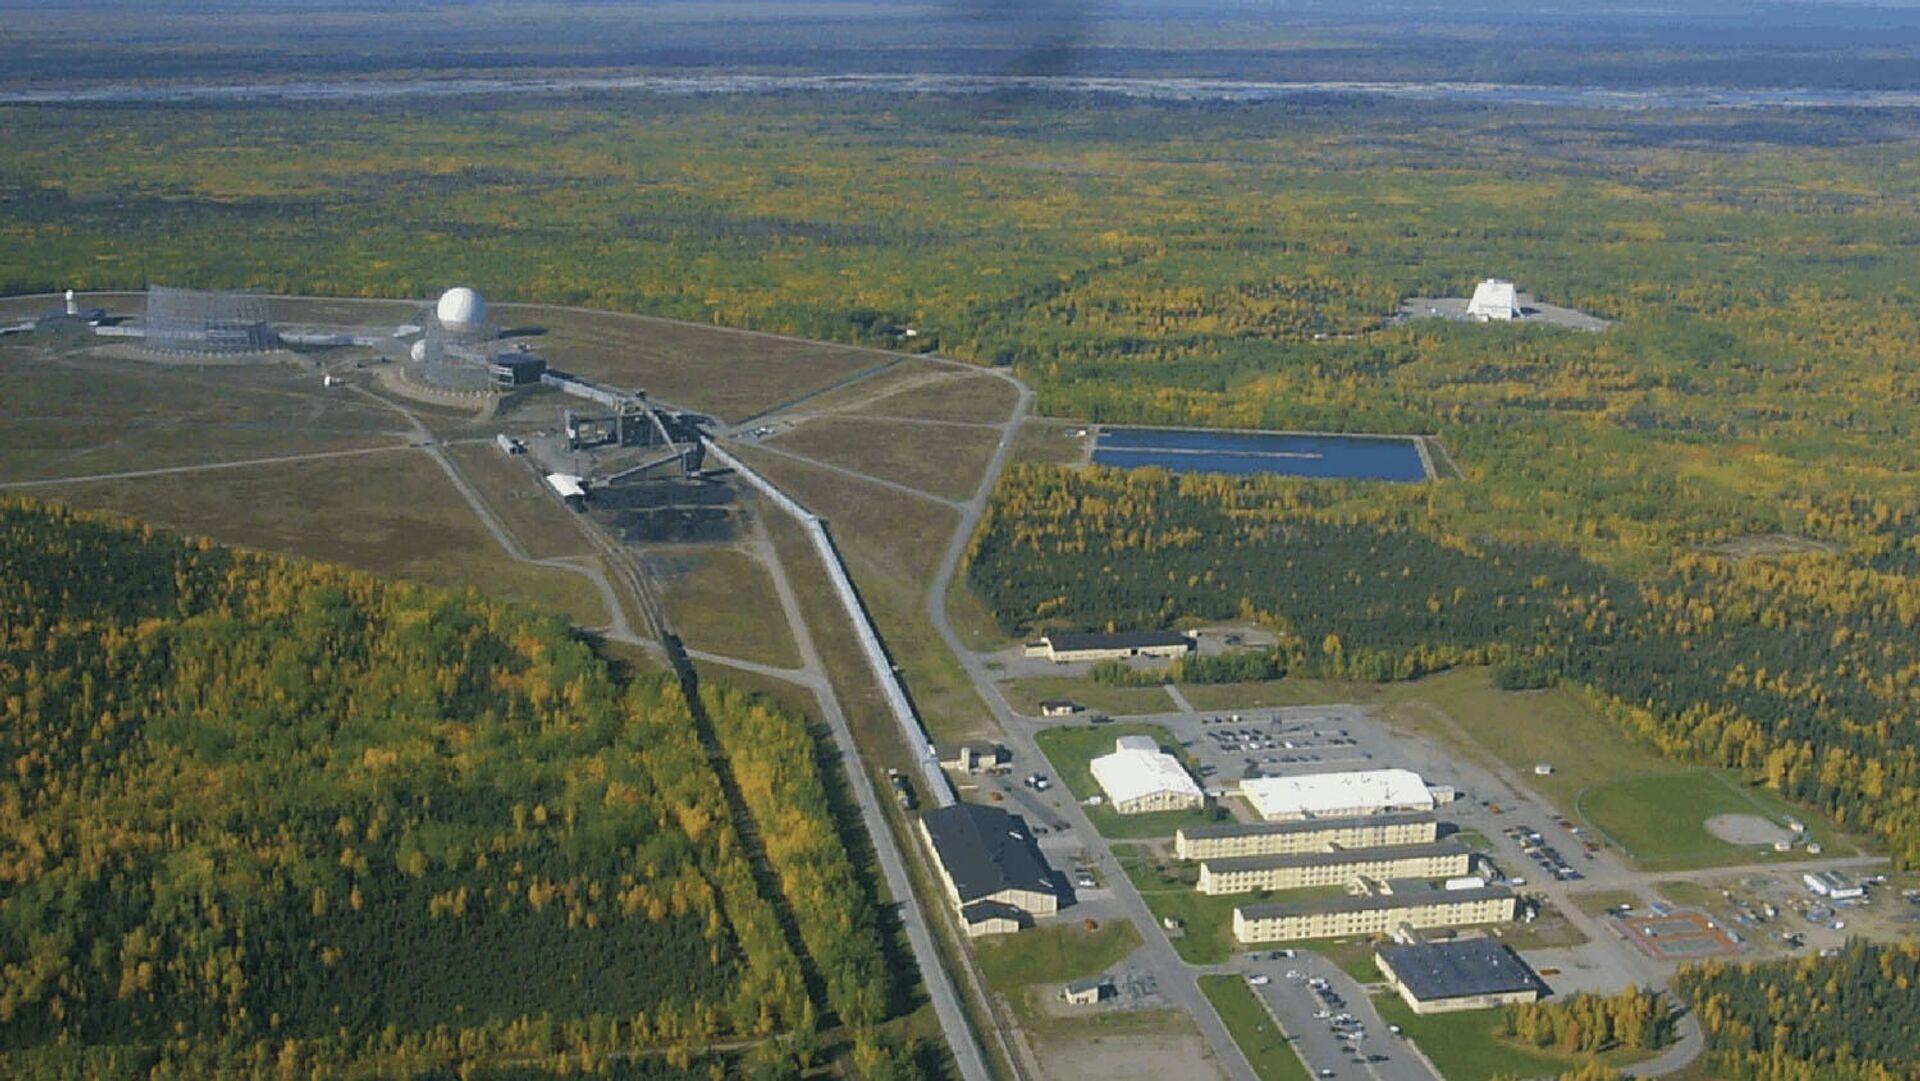 Радиолокационная станция ВВС США Clear Air Force Station на Аляске - РИА Новости, 1920, 12.03.2021